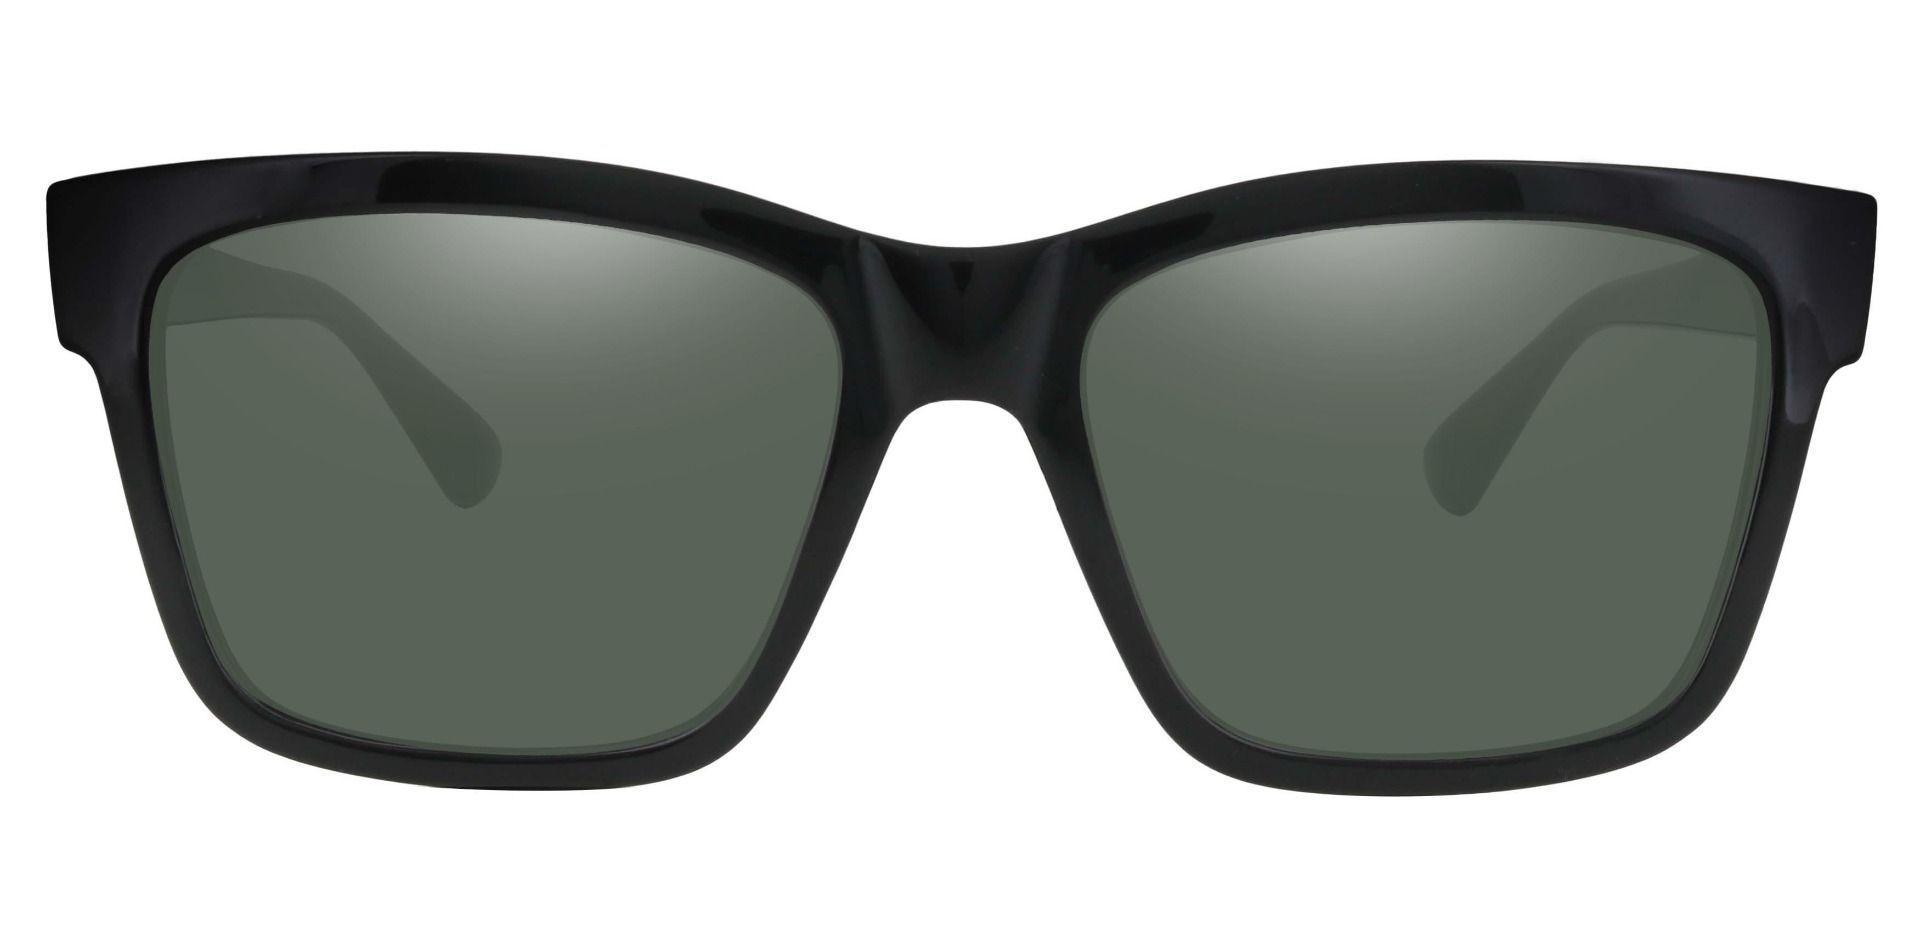 Brinley Square Non-Rx Sunglasses - Black Frame With Green Lenses